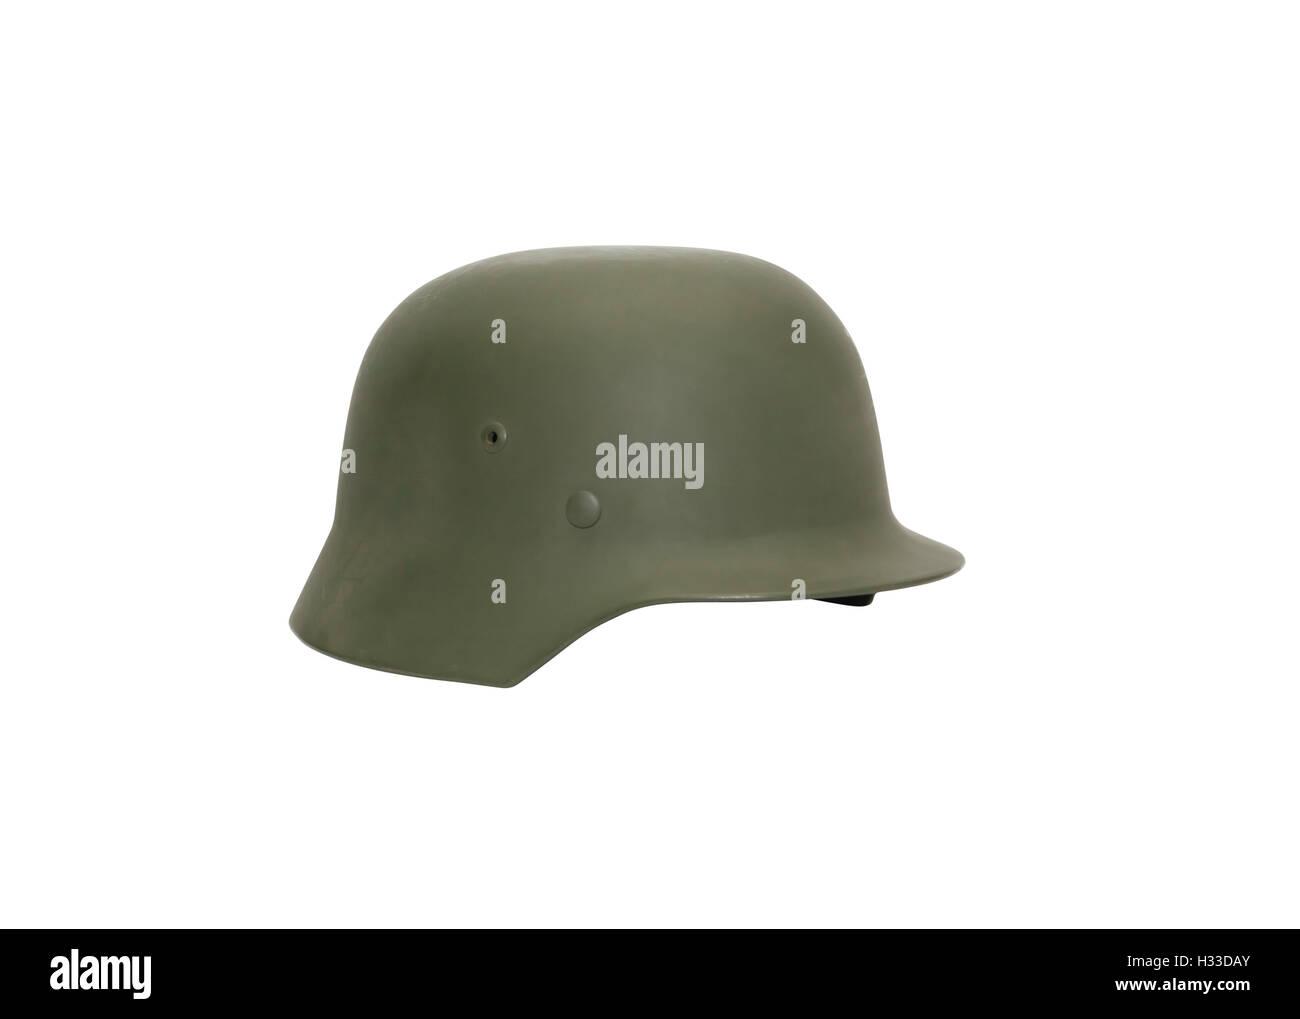 German Military Helmet Stock Photo